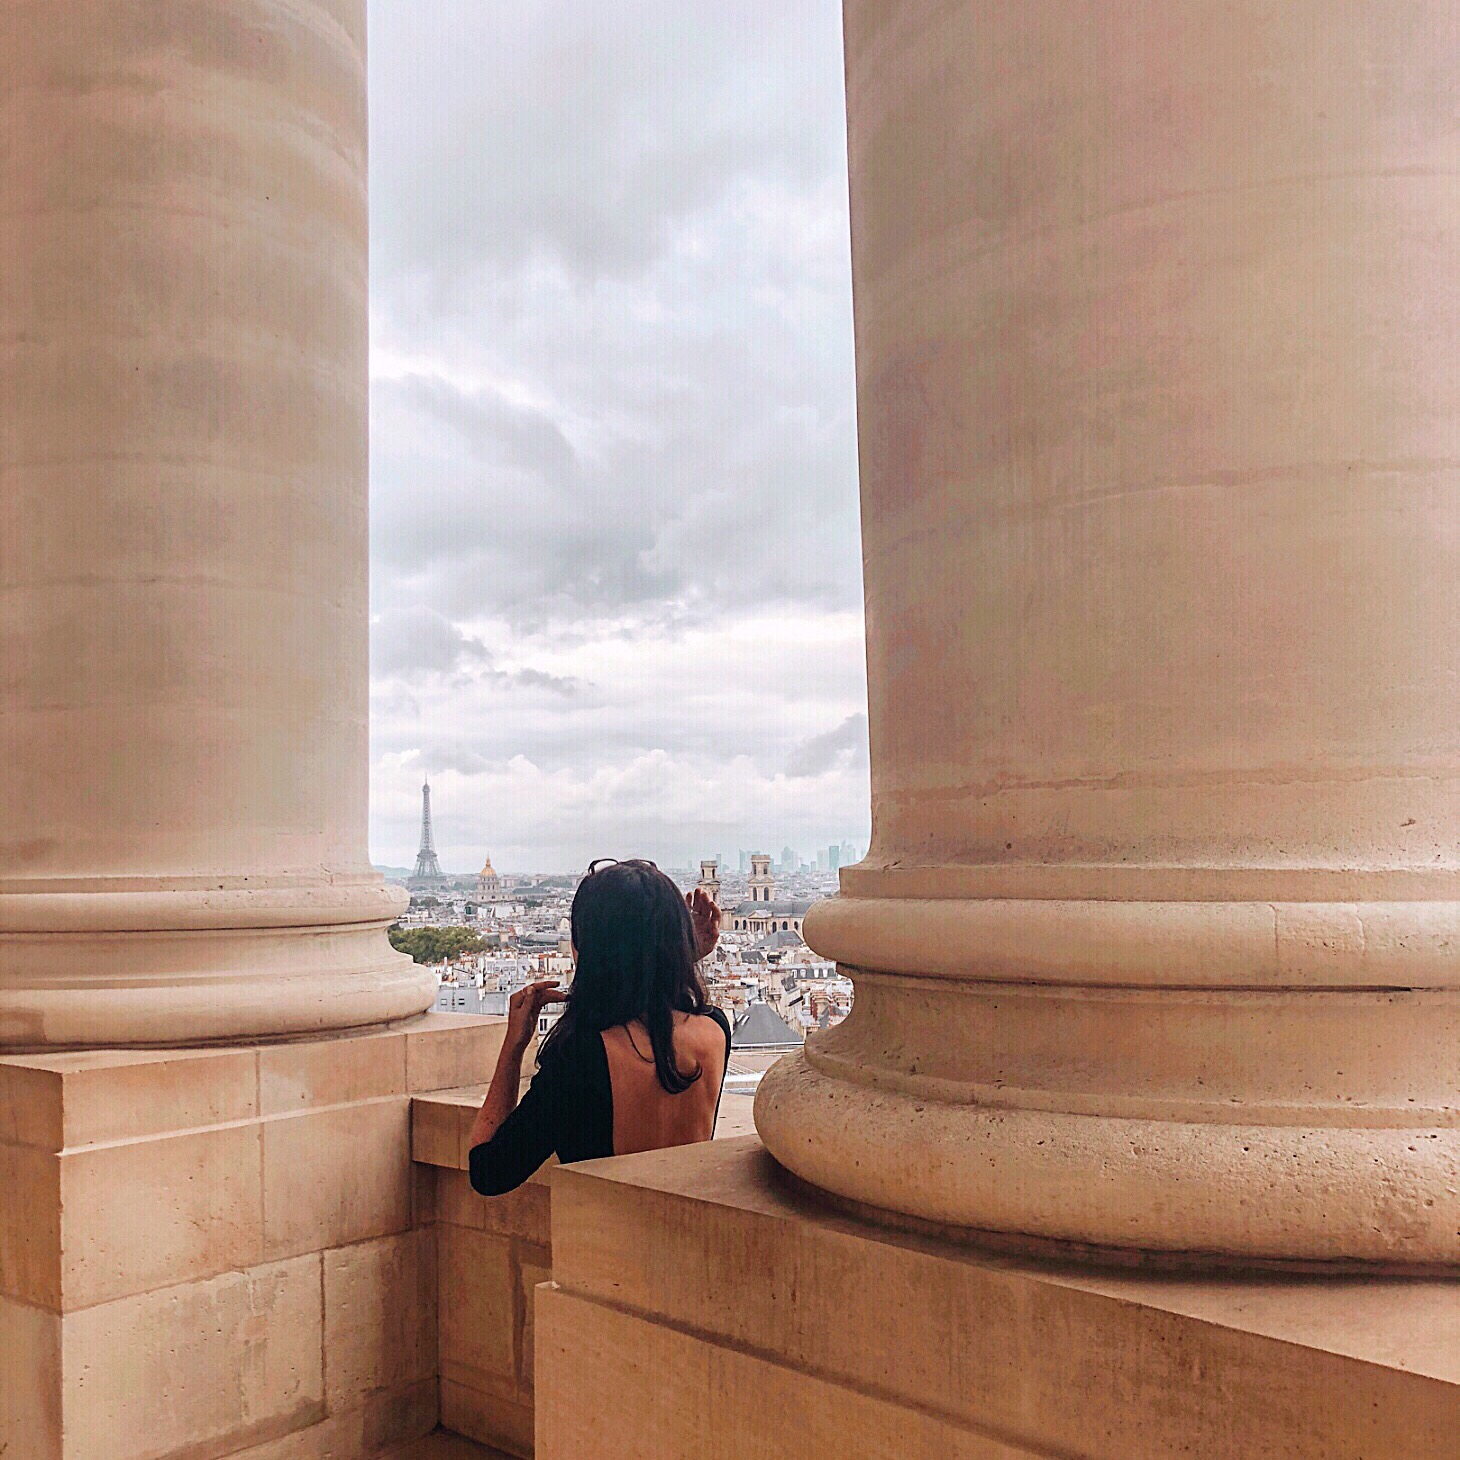 Paris Pantheon views